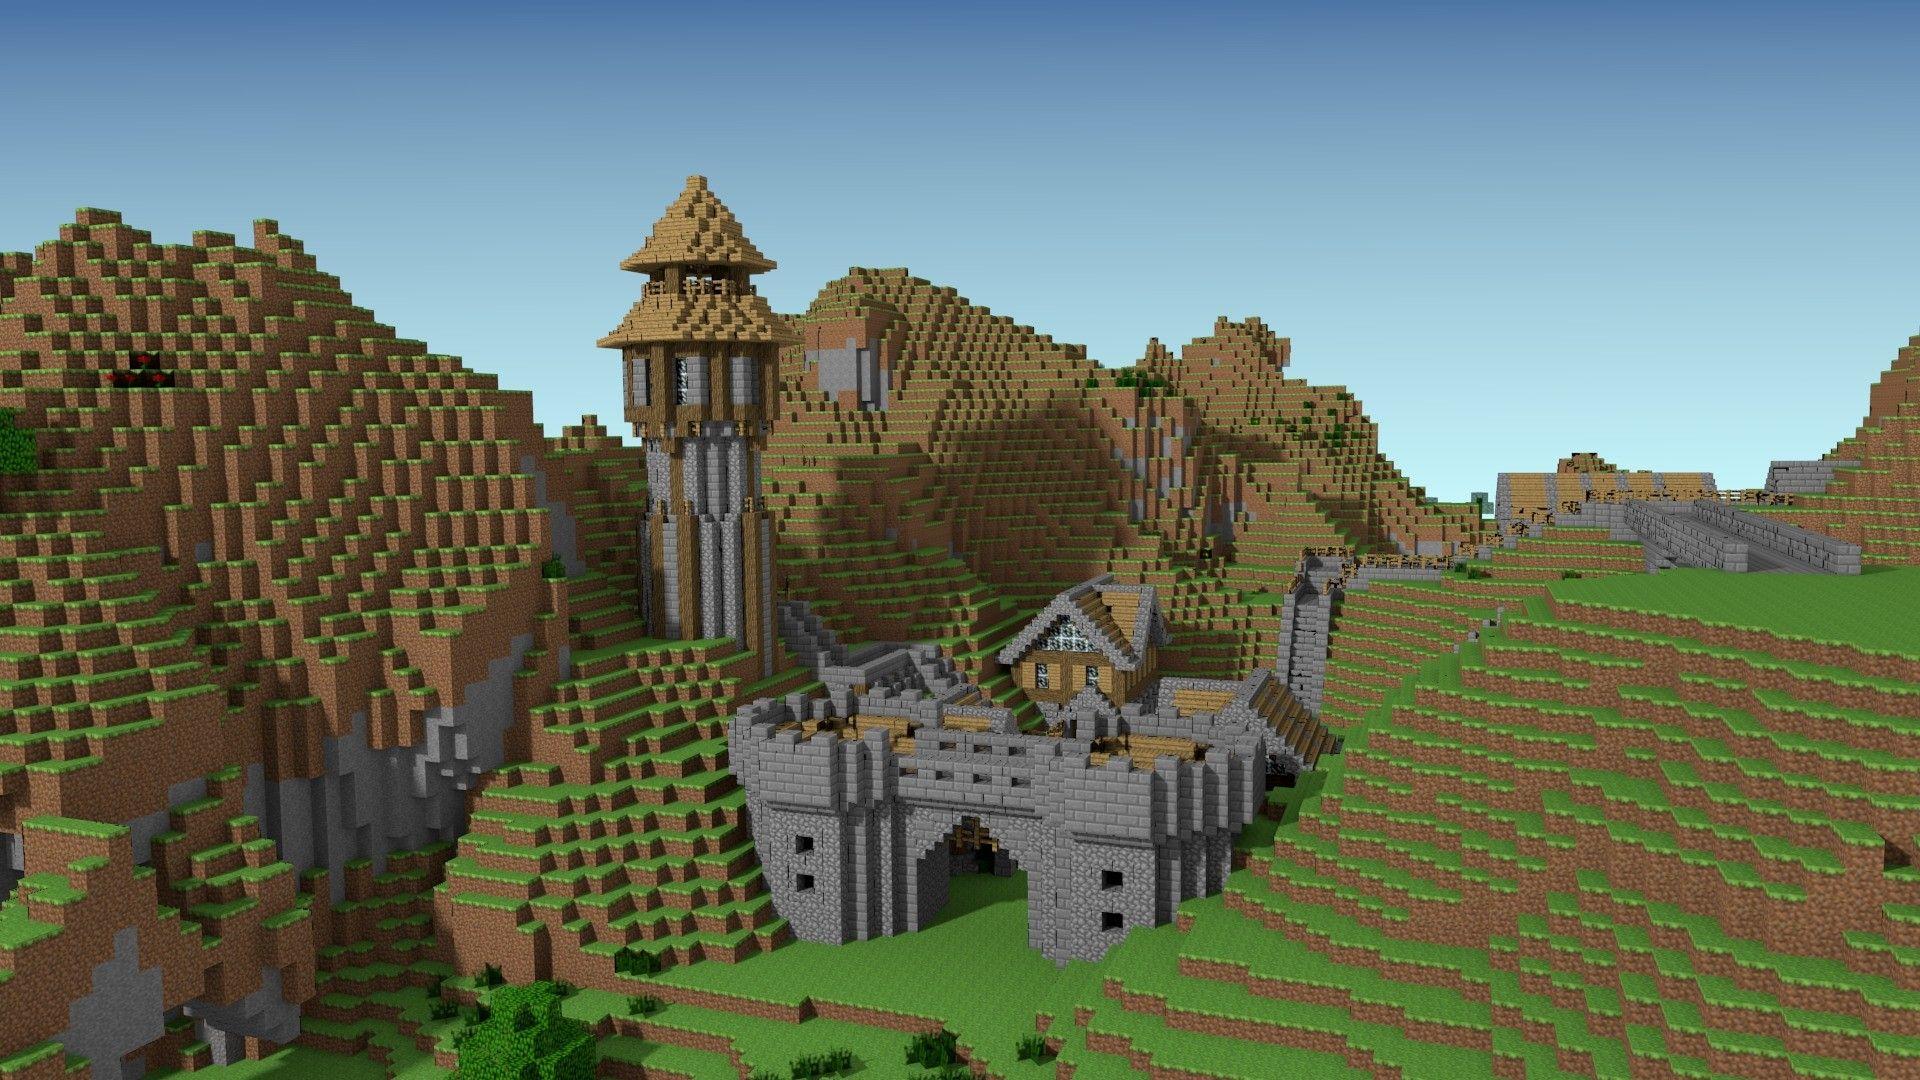 http://i.imgur.com/Be12Sko12.jpg  Village house design, Minecraft